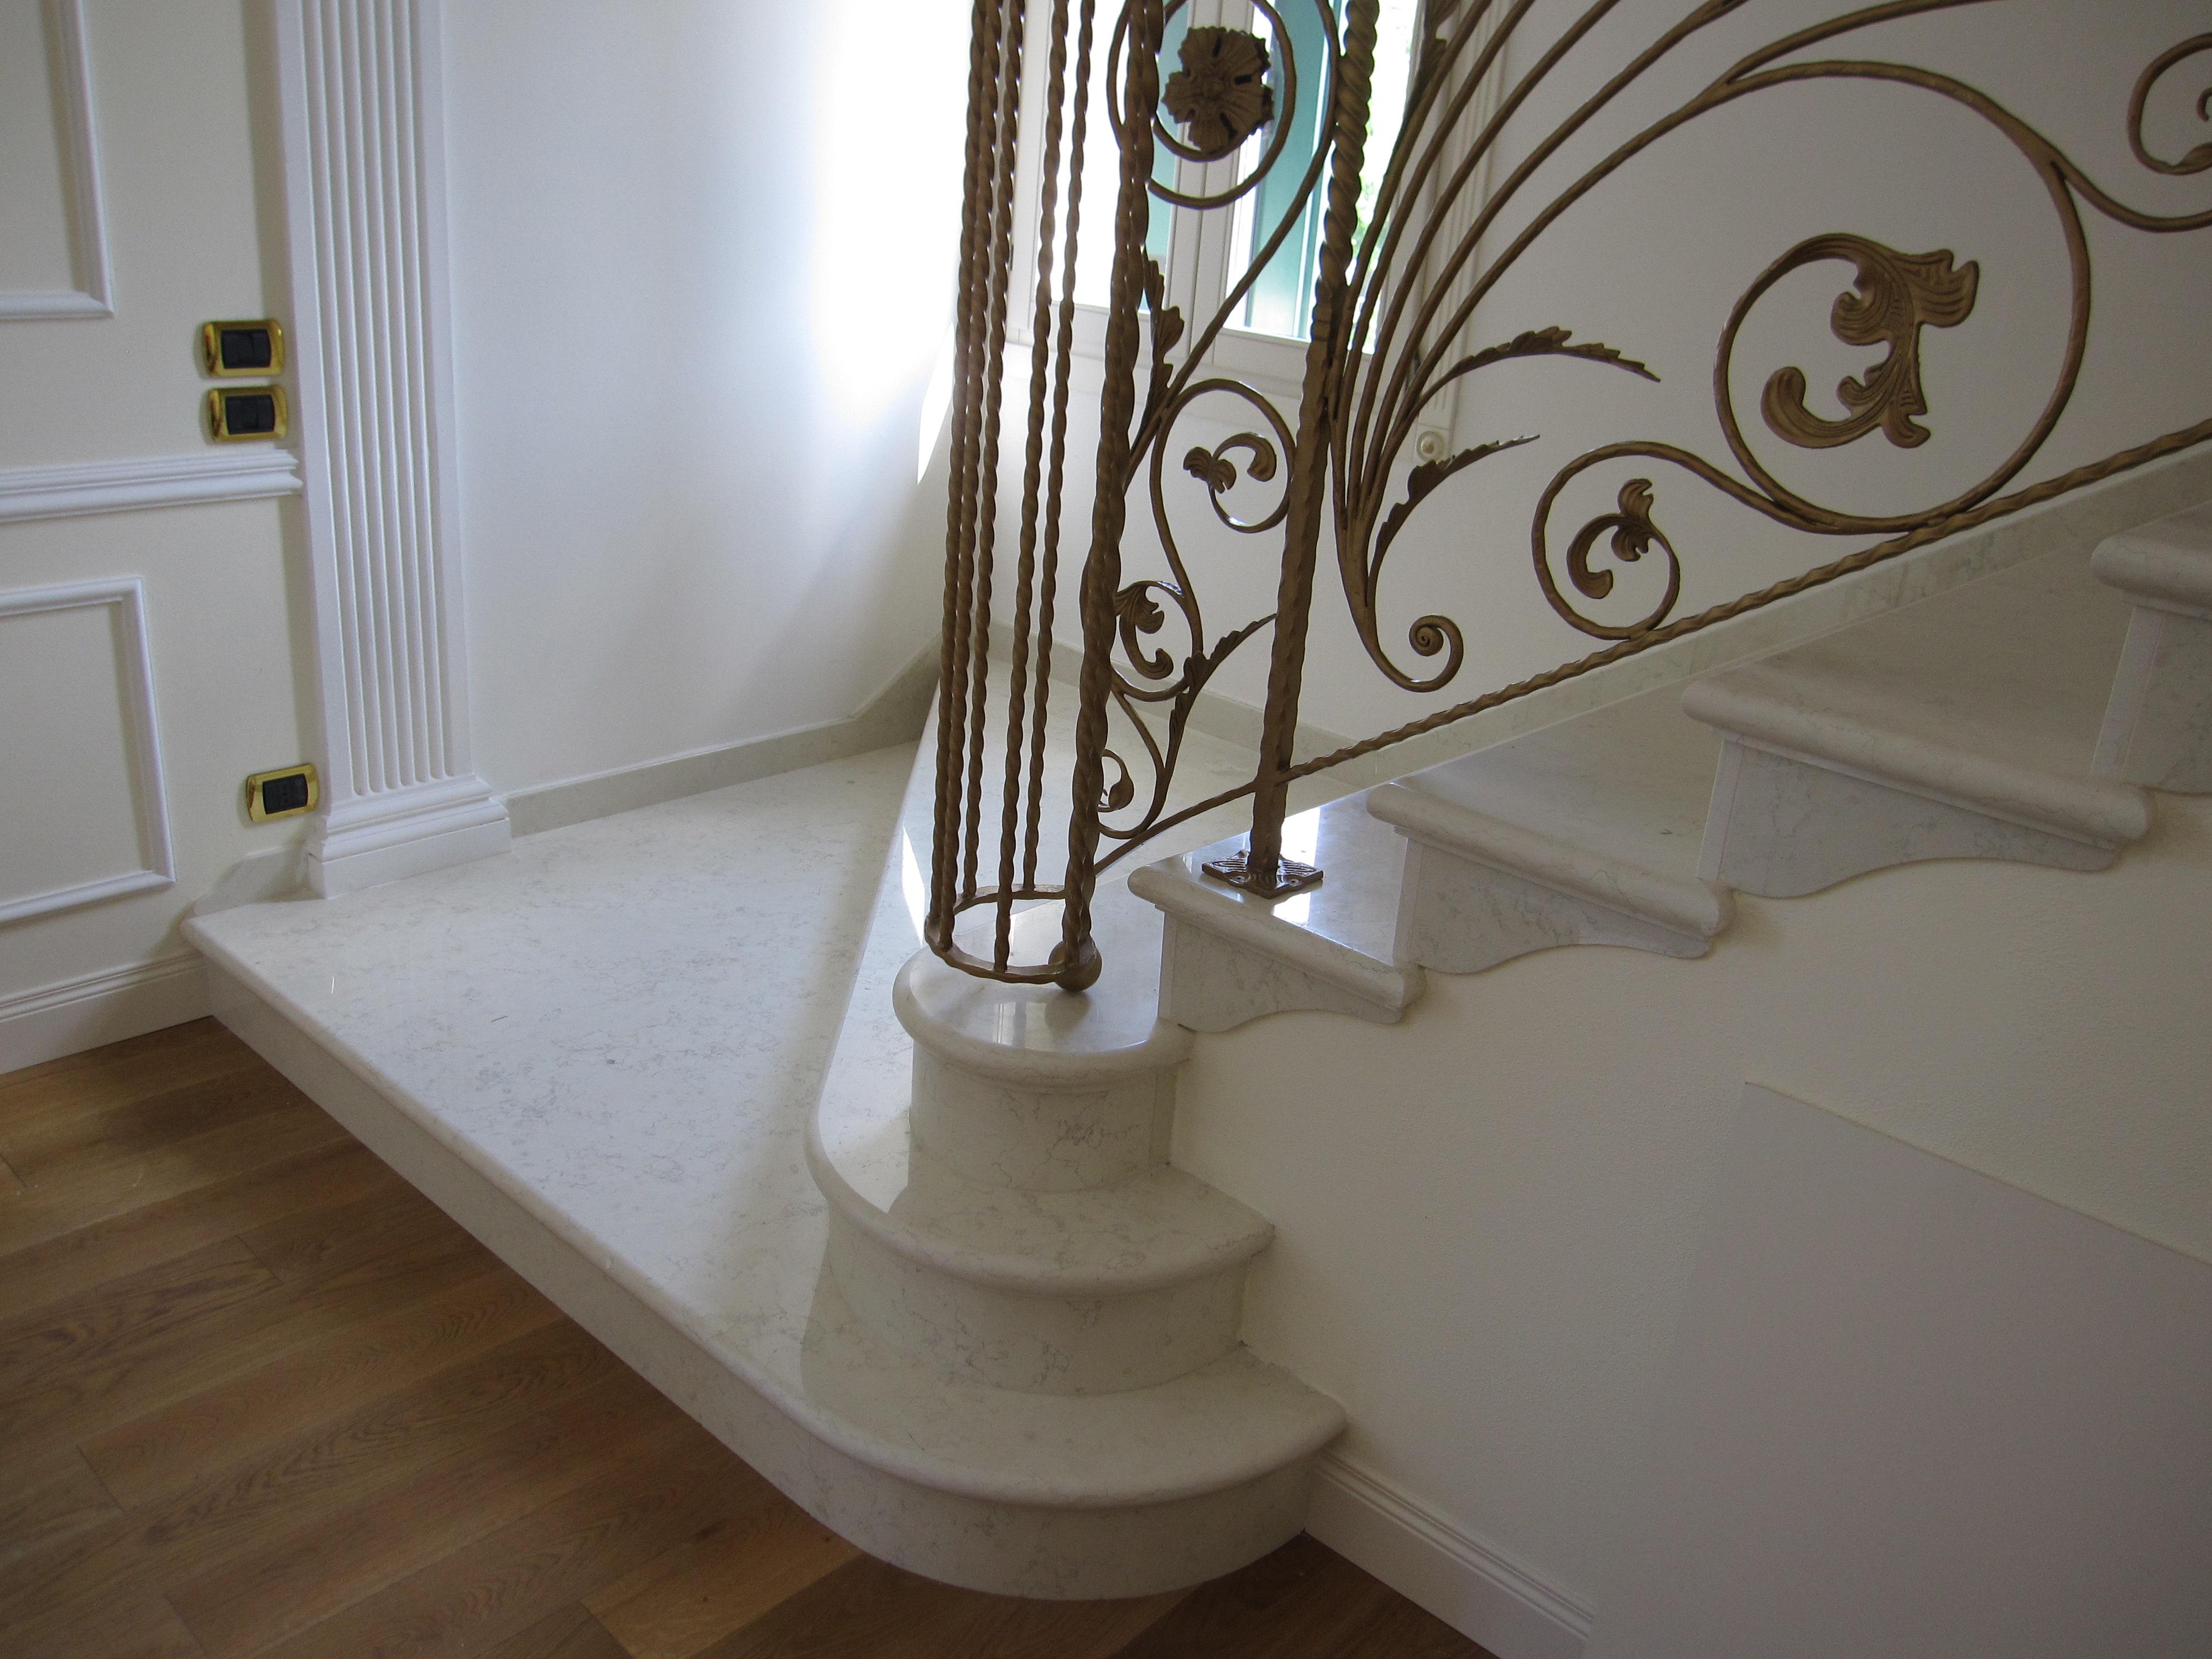 Foto di scale bellissime a prezzi affare - Immagini di scale ...